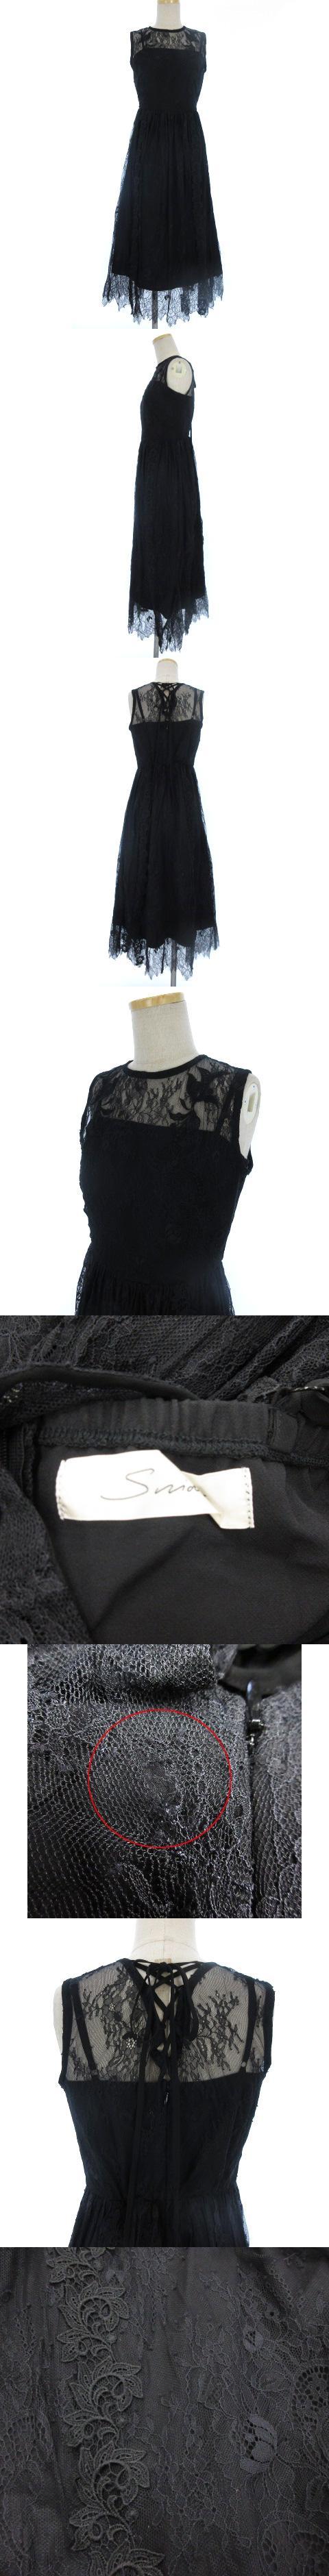 18SS レース エンブロイダリー ロング ワンピース ノースリーブ 刺繍 F 黒 ブラック ■ER